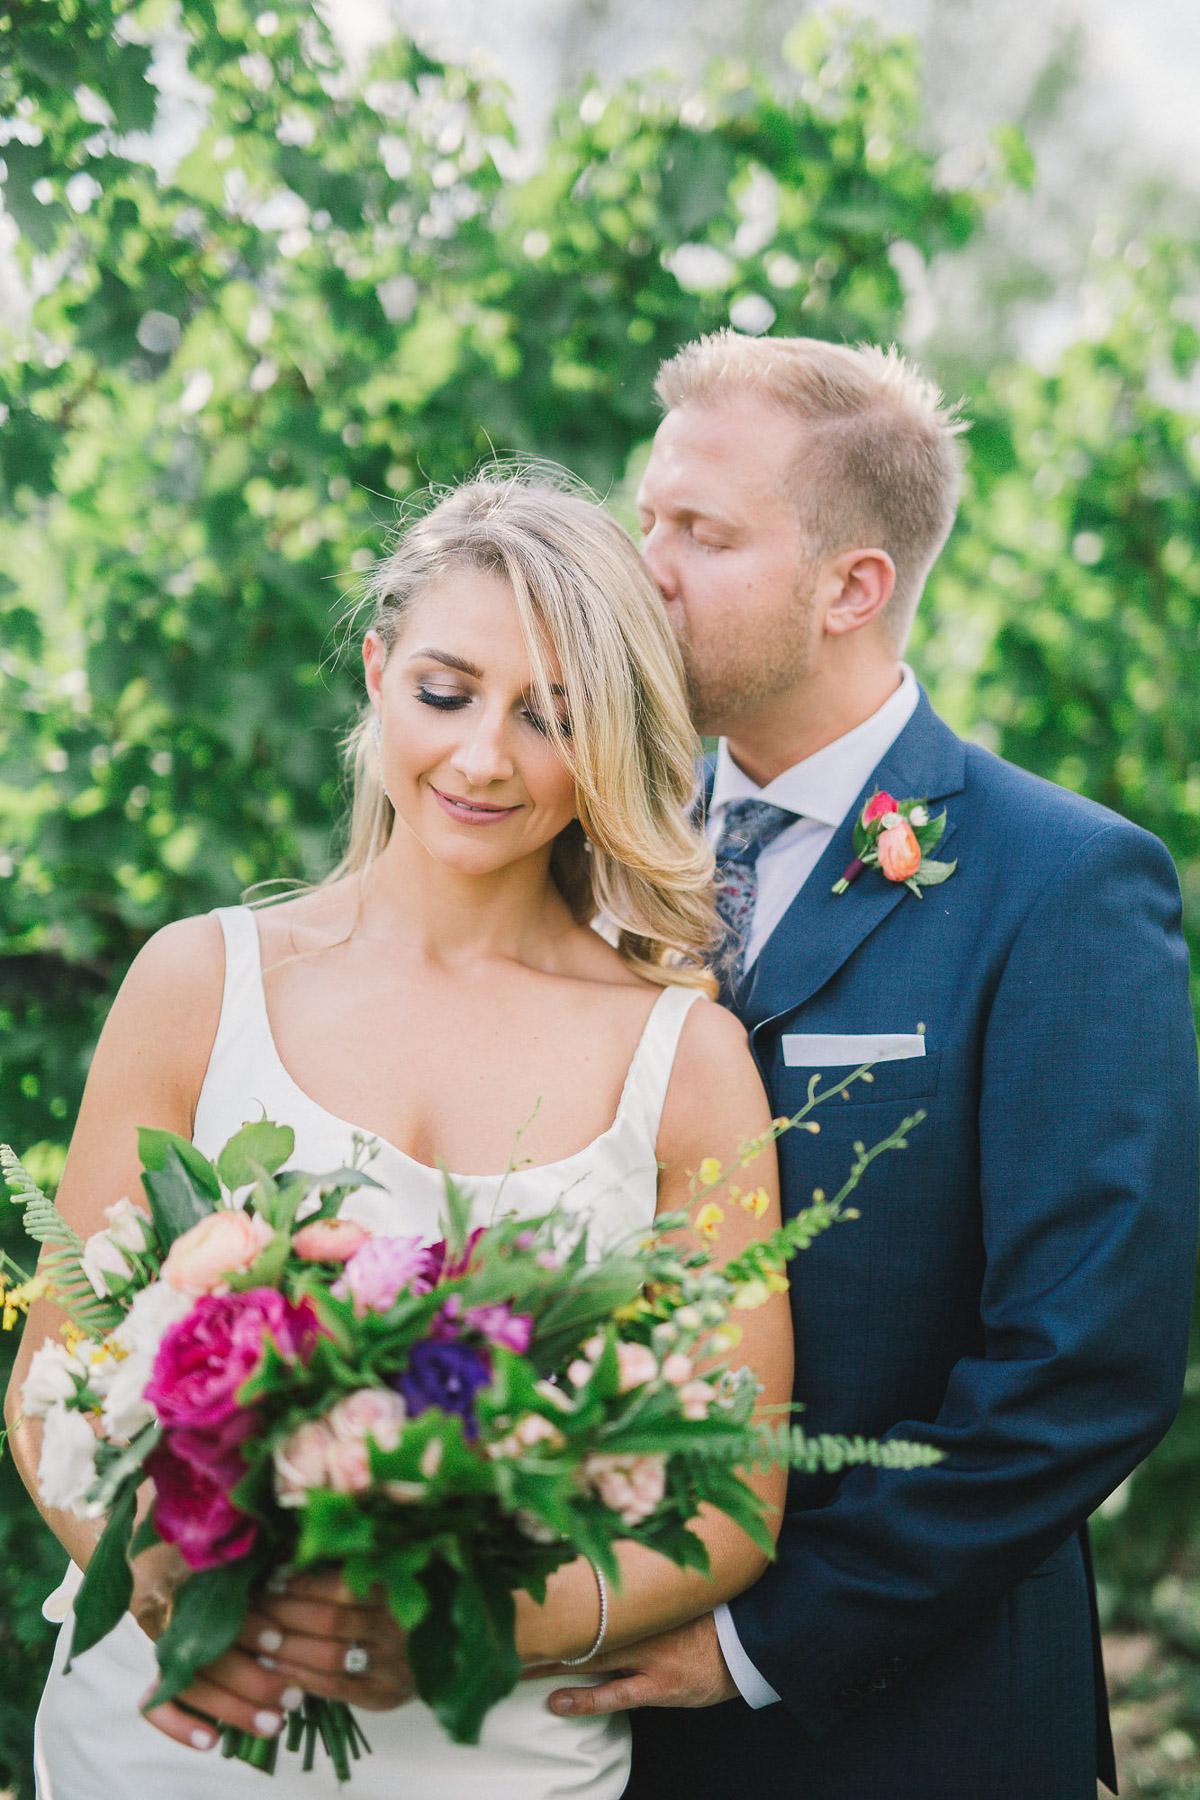 julia-park-photography-vineyard-bride-swish-list-stratus-winery-niagara-on-the-lake-wedding-6.jpg